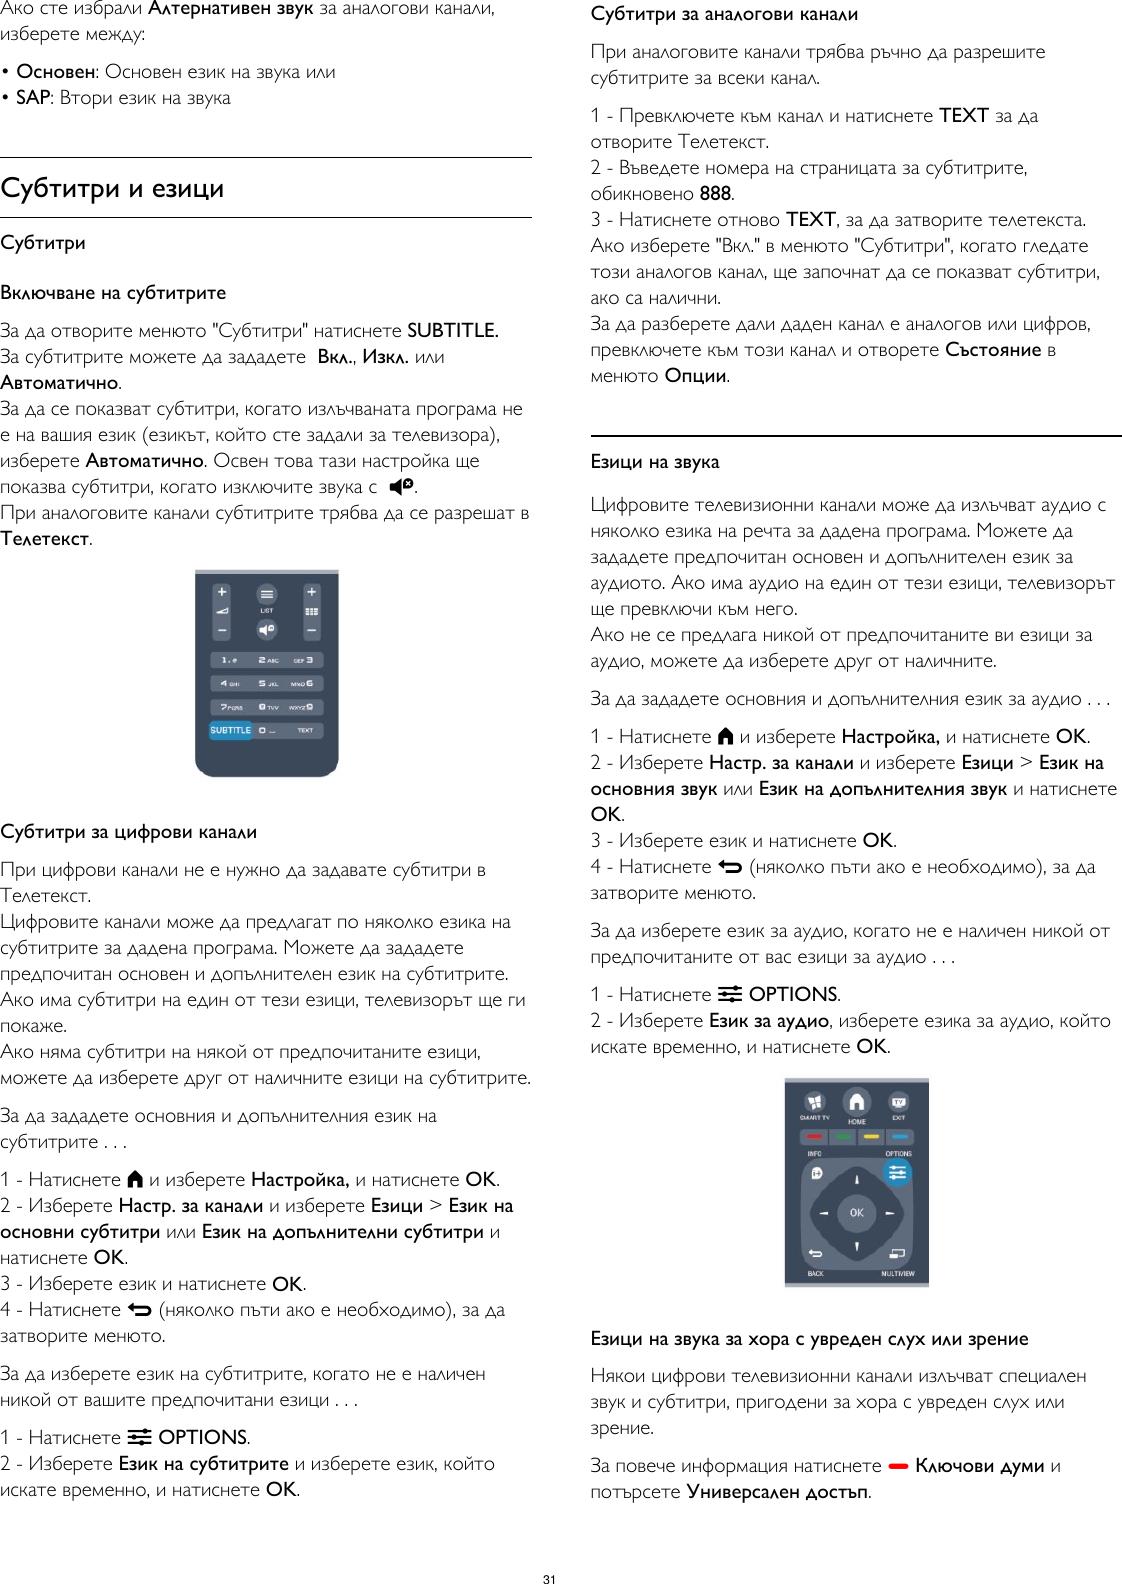 Philips 32PFT5509/12 User Manual Kyttopas 32pft5509 12 Dfu Bul